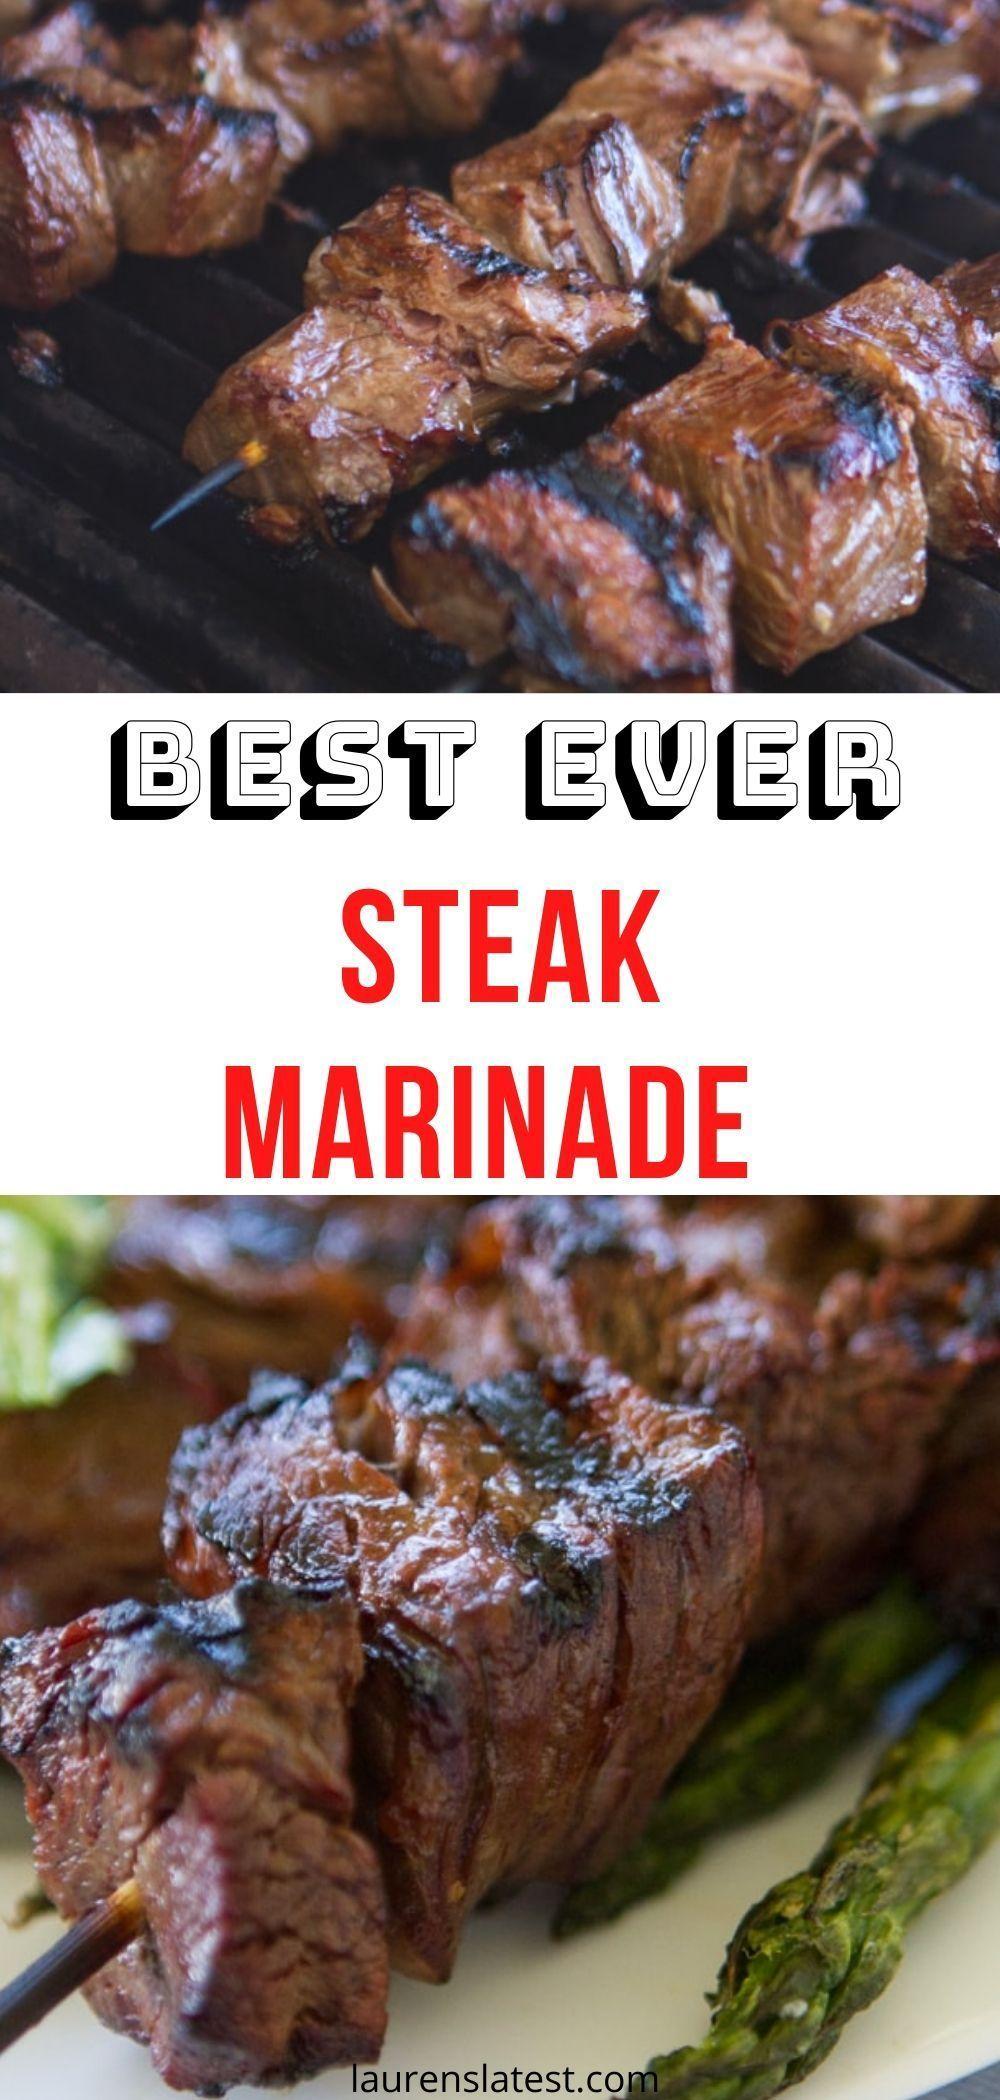 The Best Steak Marinade | Lauren's Latest